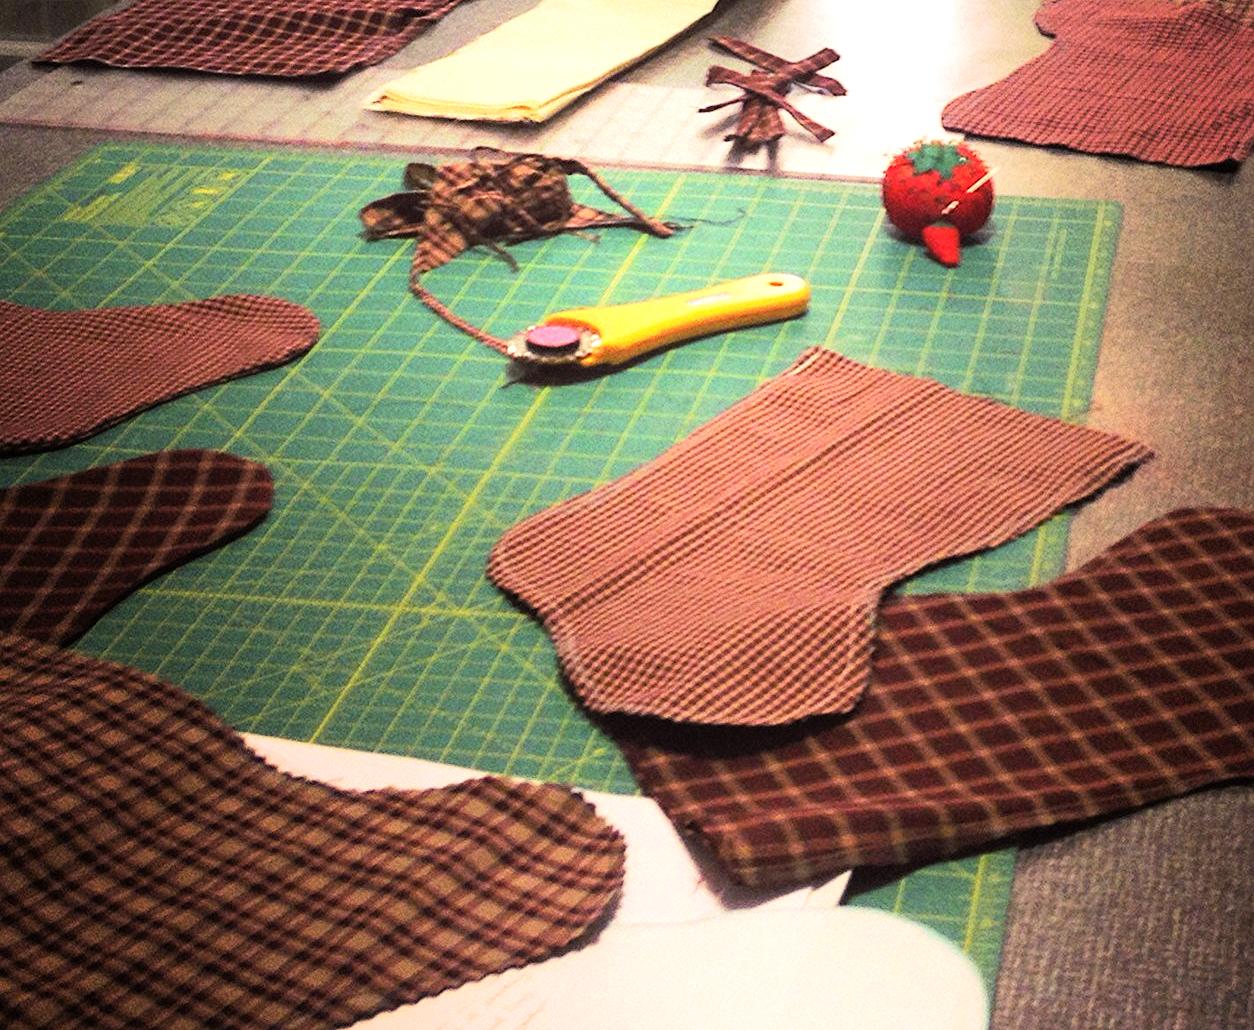 Sew You Studio | Sew Giving: stockings